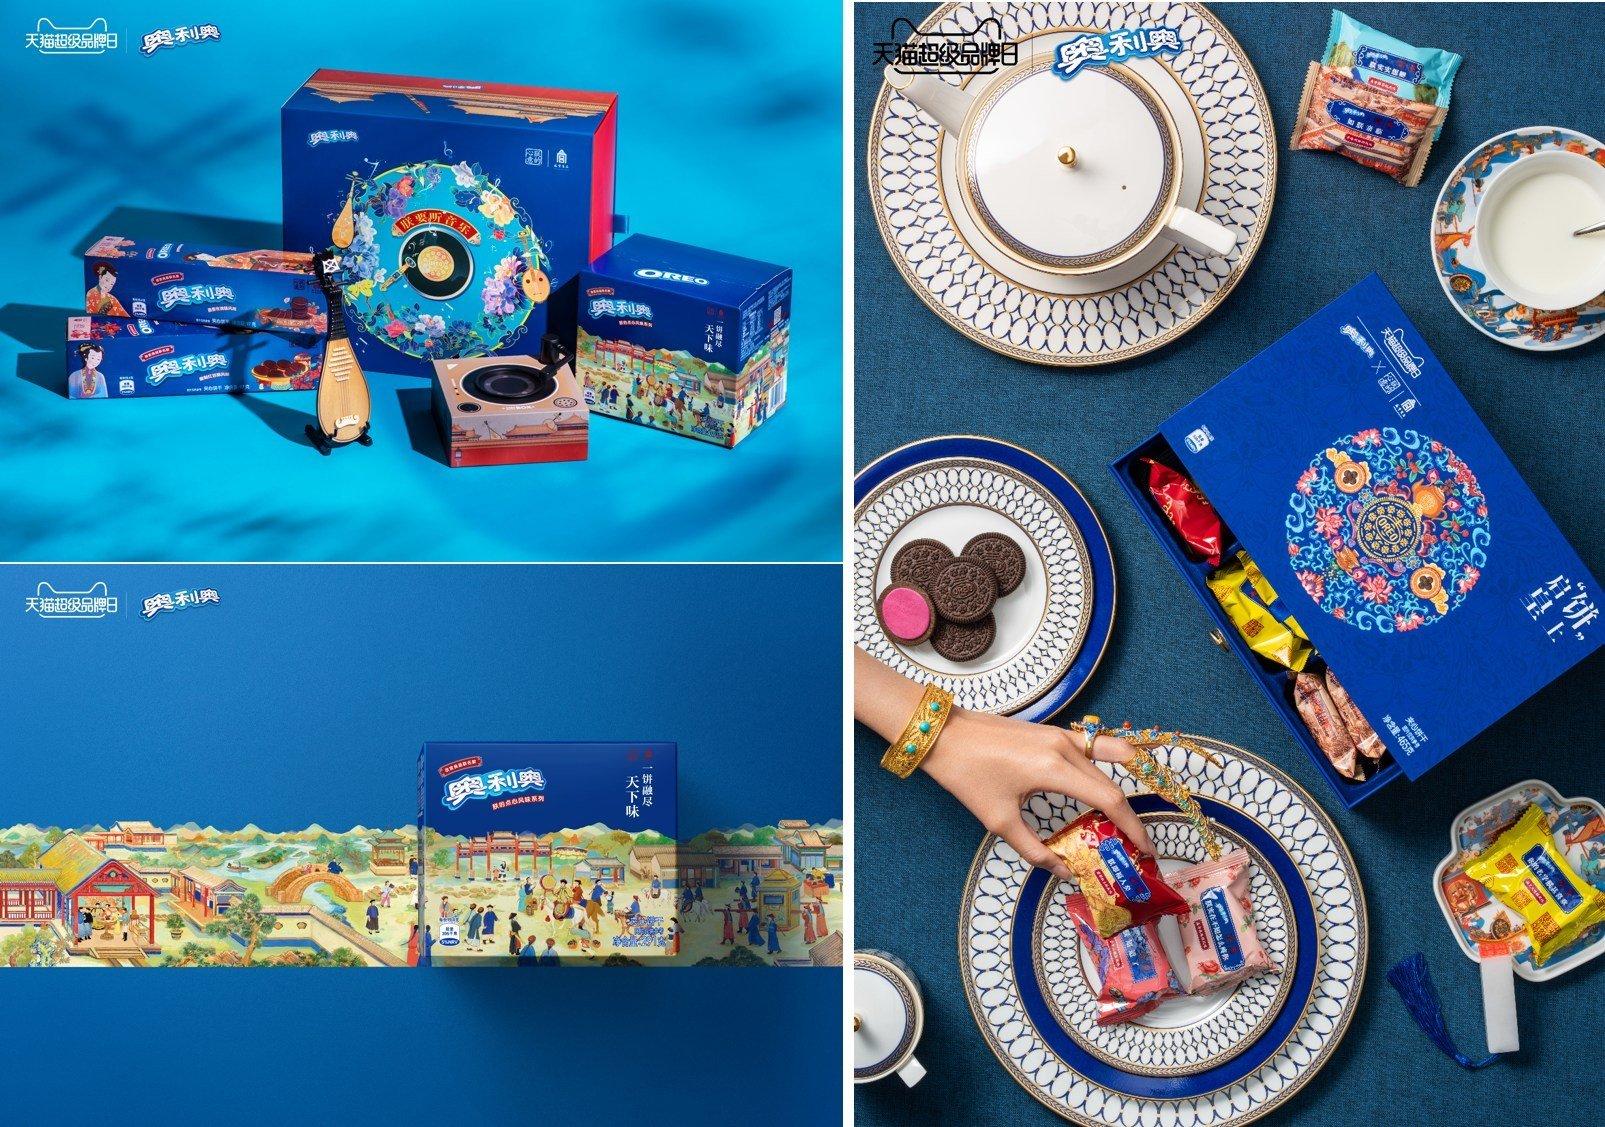 Oreo's China Six Flavors gift box